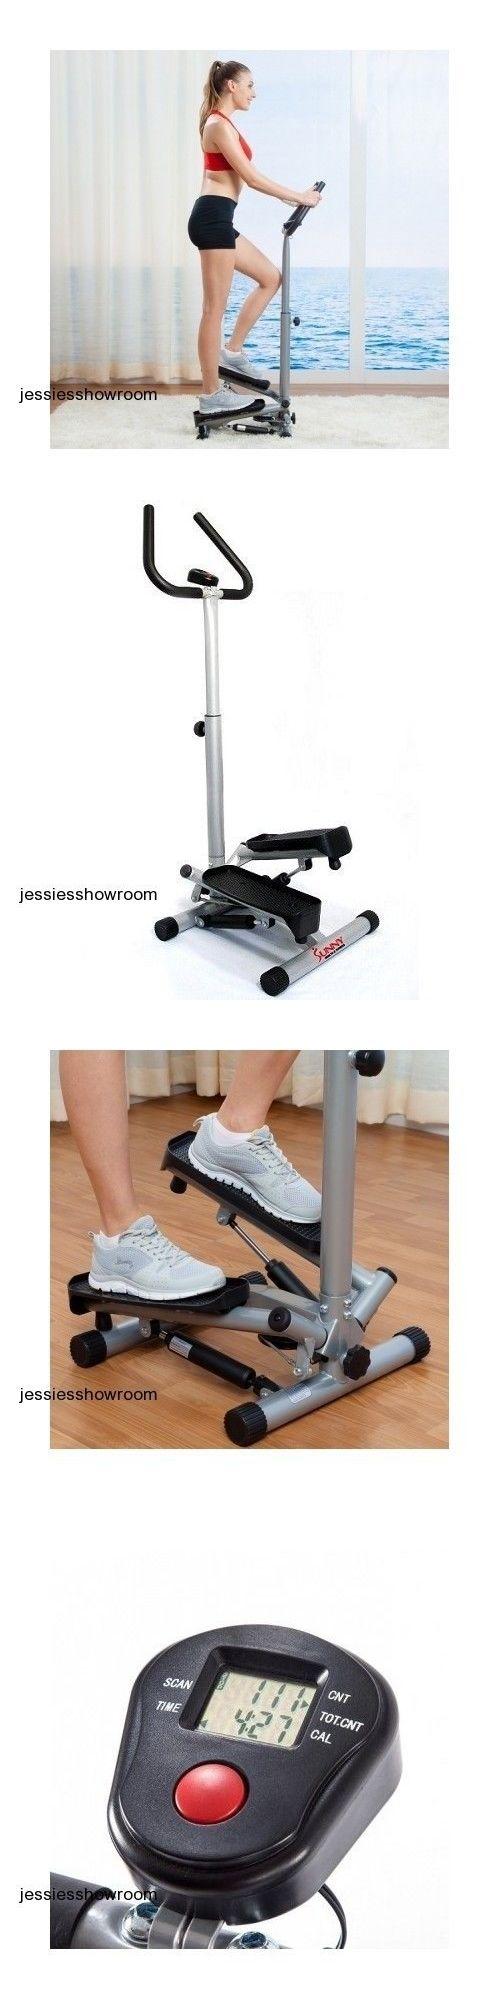 stair stepper workout machine